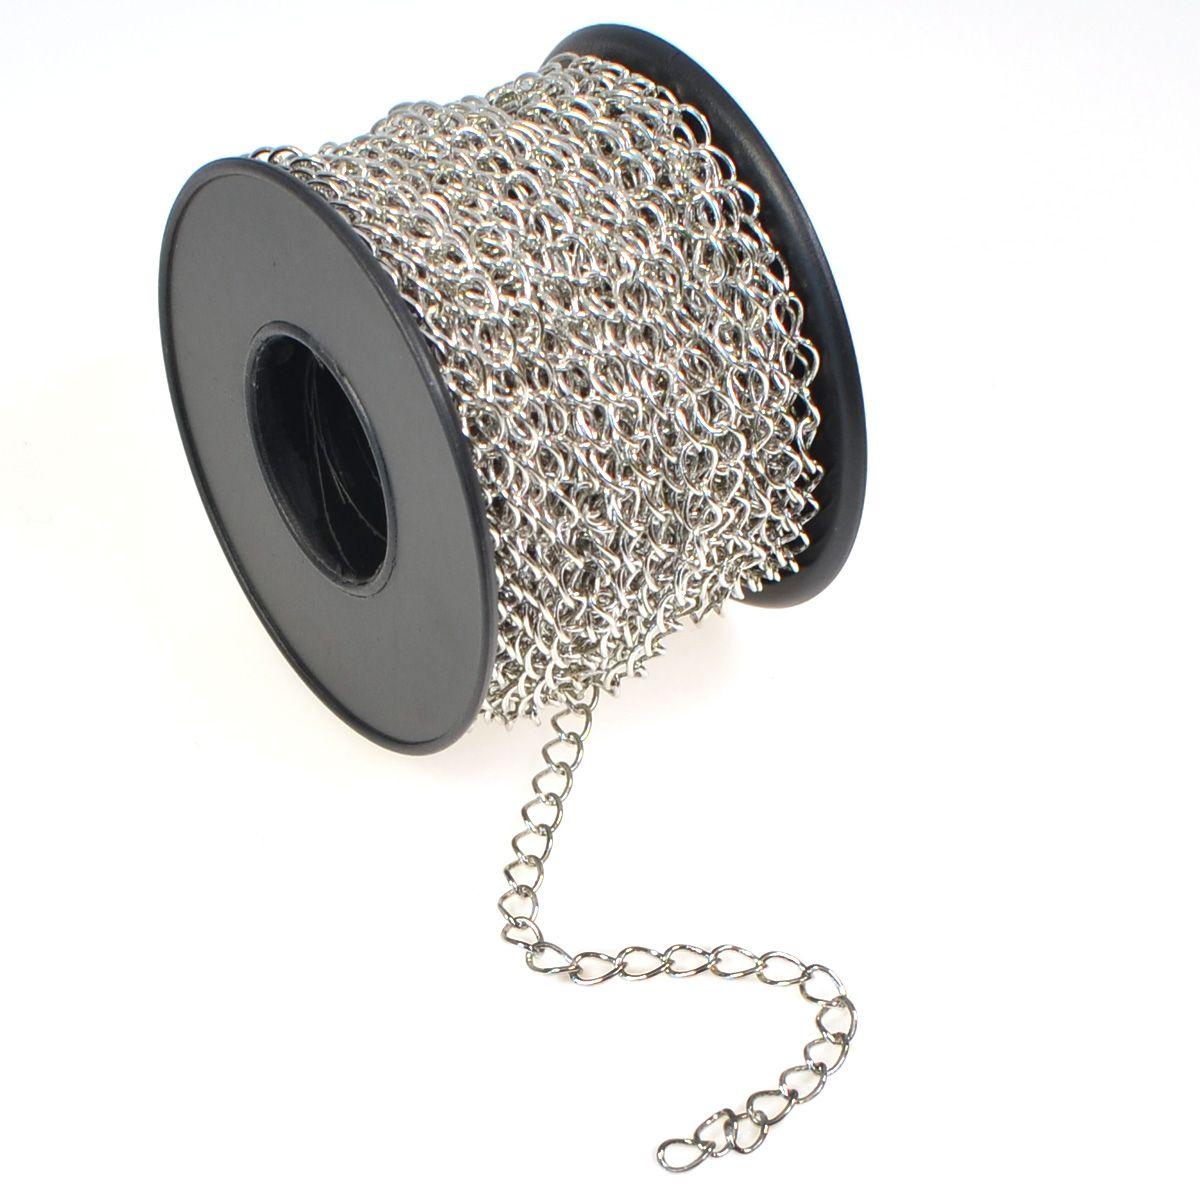 Jewelry Making Supplies & Findings | Rings & Things